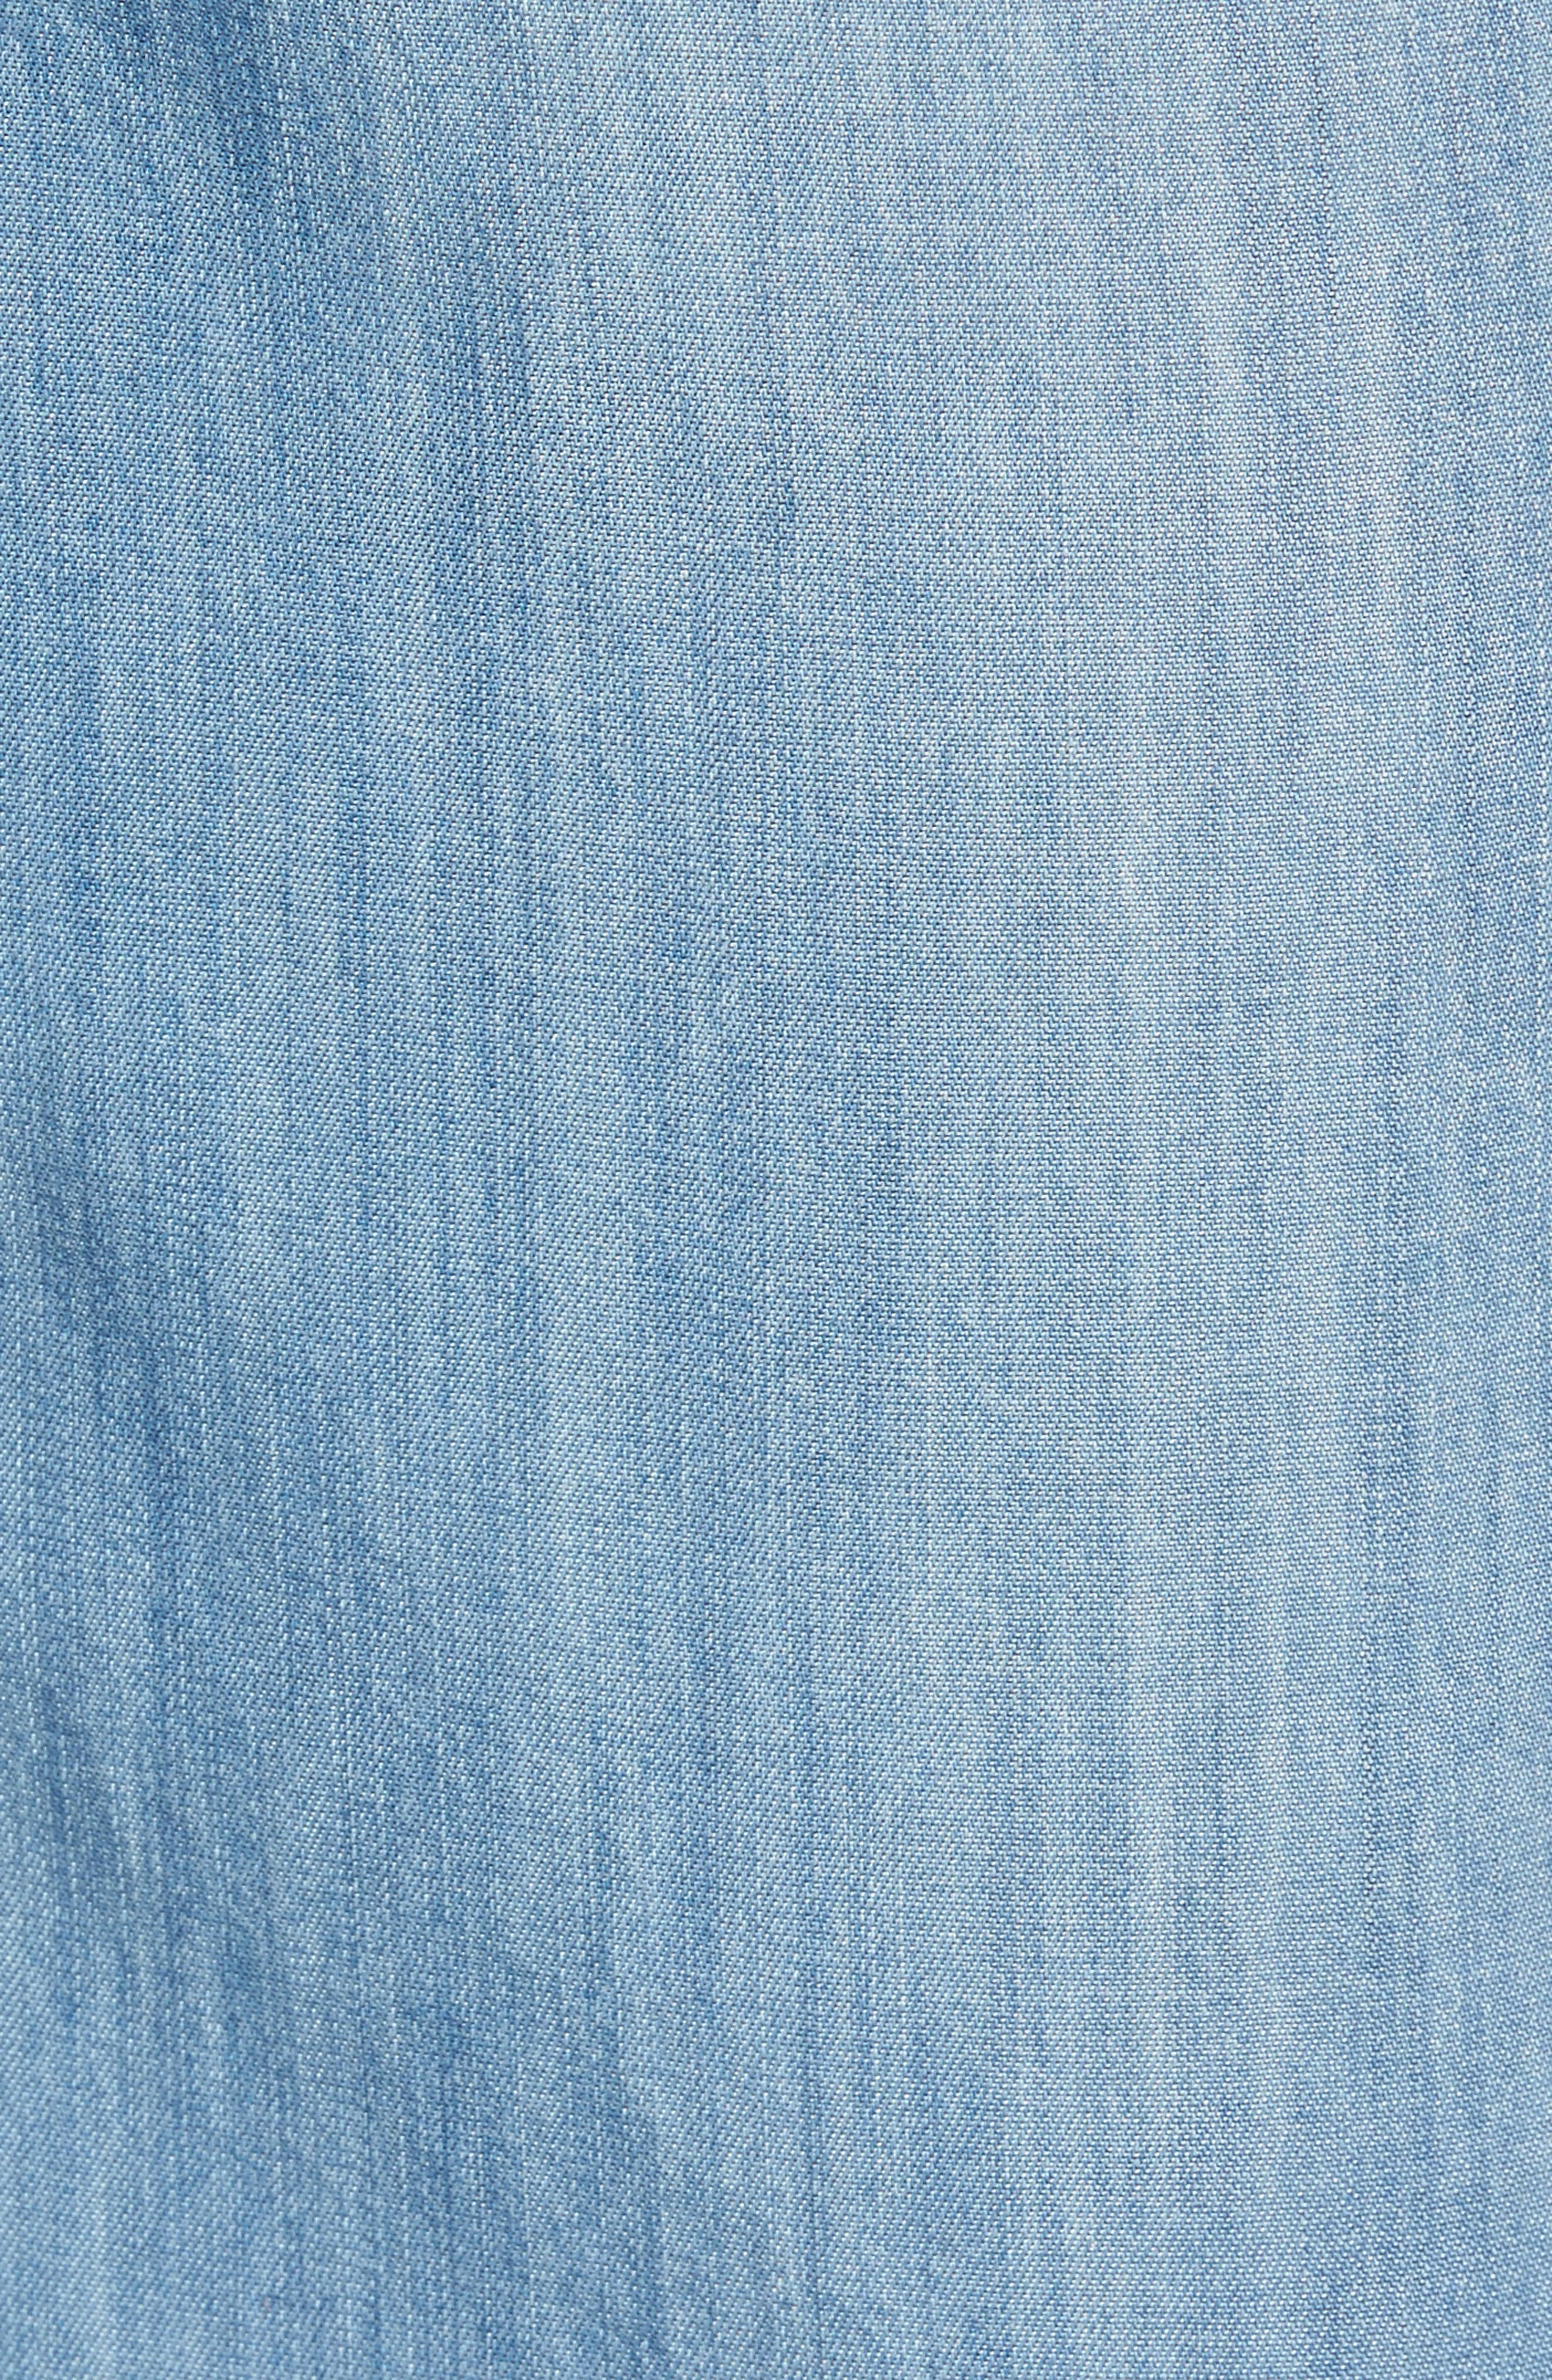 Drawstring Wide Leg Pants,                             Alternate thumbnail 5, color,                             Medium Blue